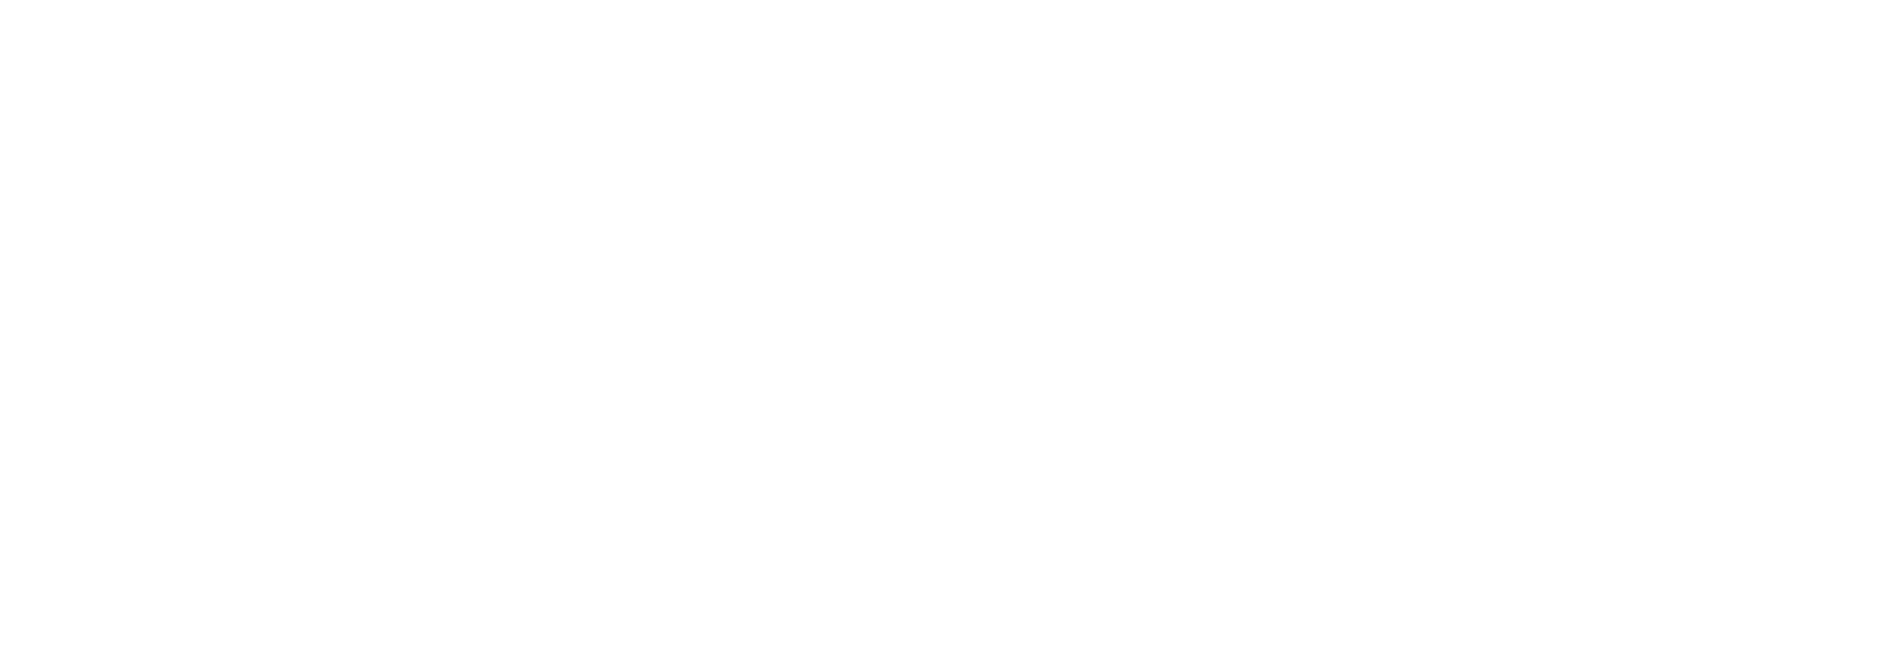 Caption2 slide_1 texni